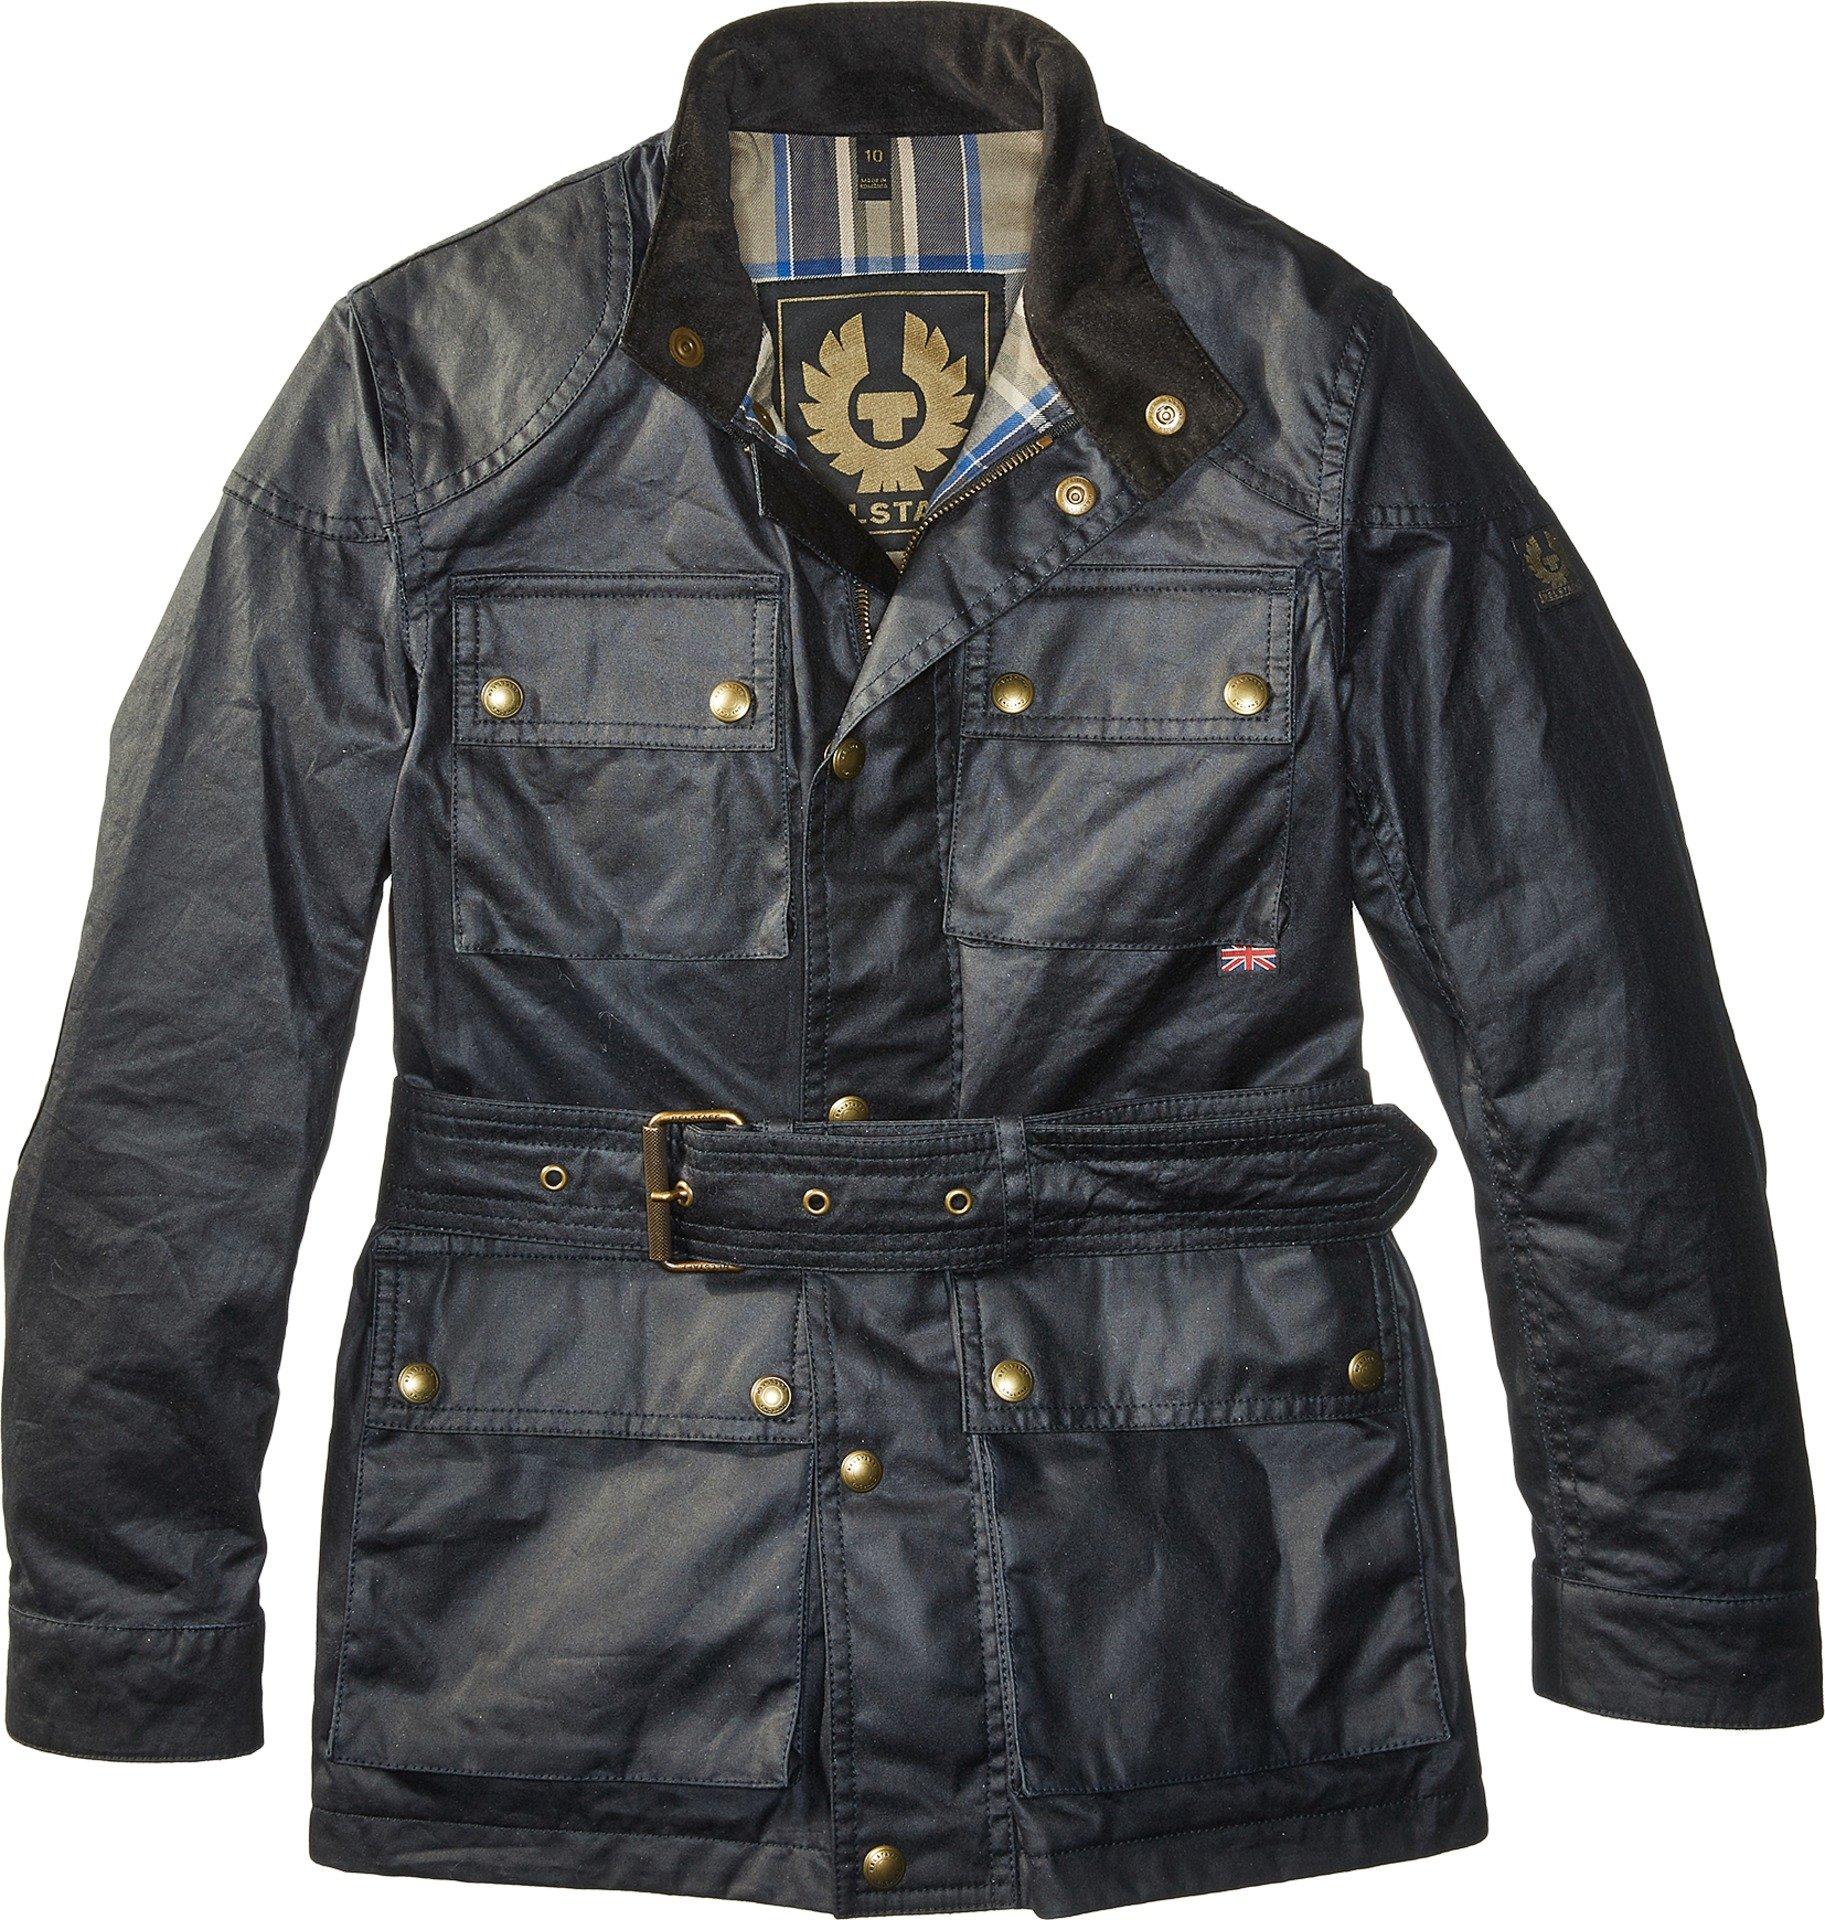 BELSTAFF Unisex Roadmaster Junior Jacket (Big Kids) Dark Navy 8 Years